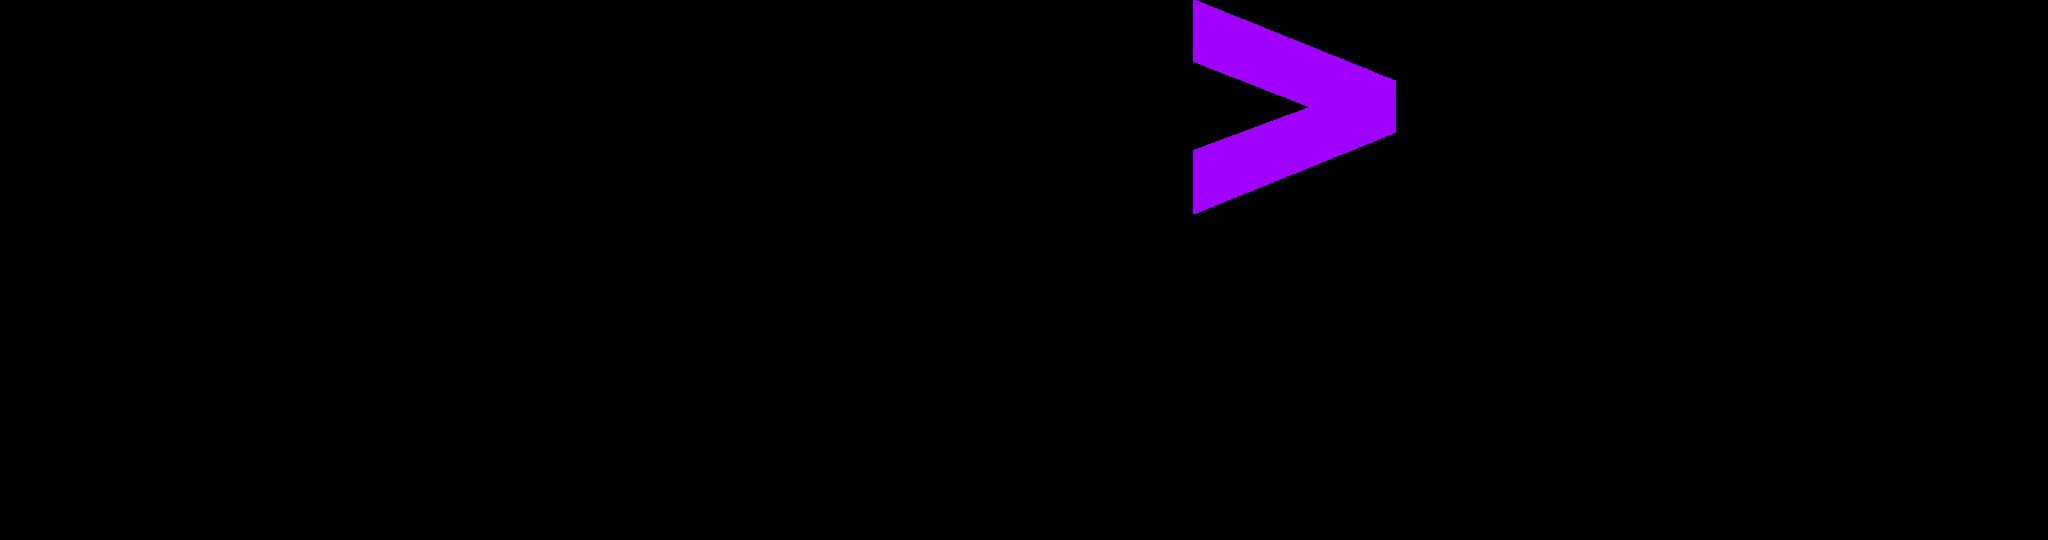 Skills To Succeed – Accenture nadačný fond logo